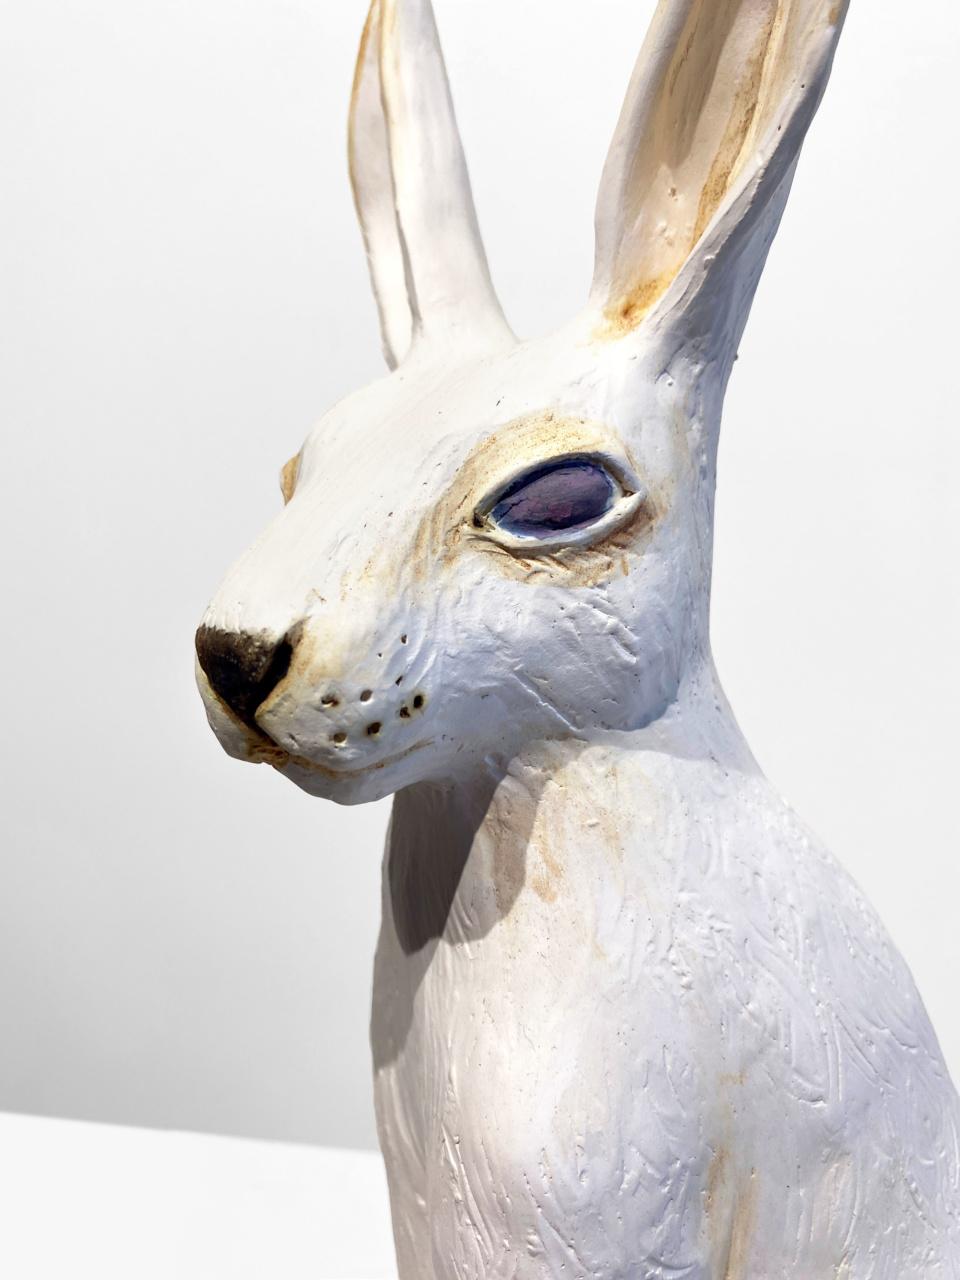 Jenny Rowe White Hare 4 2